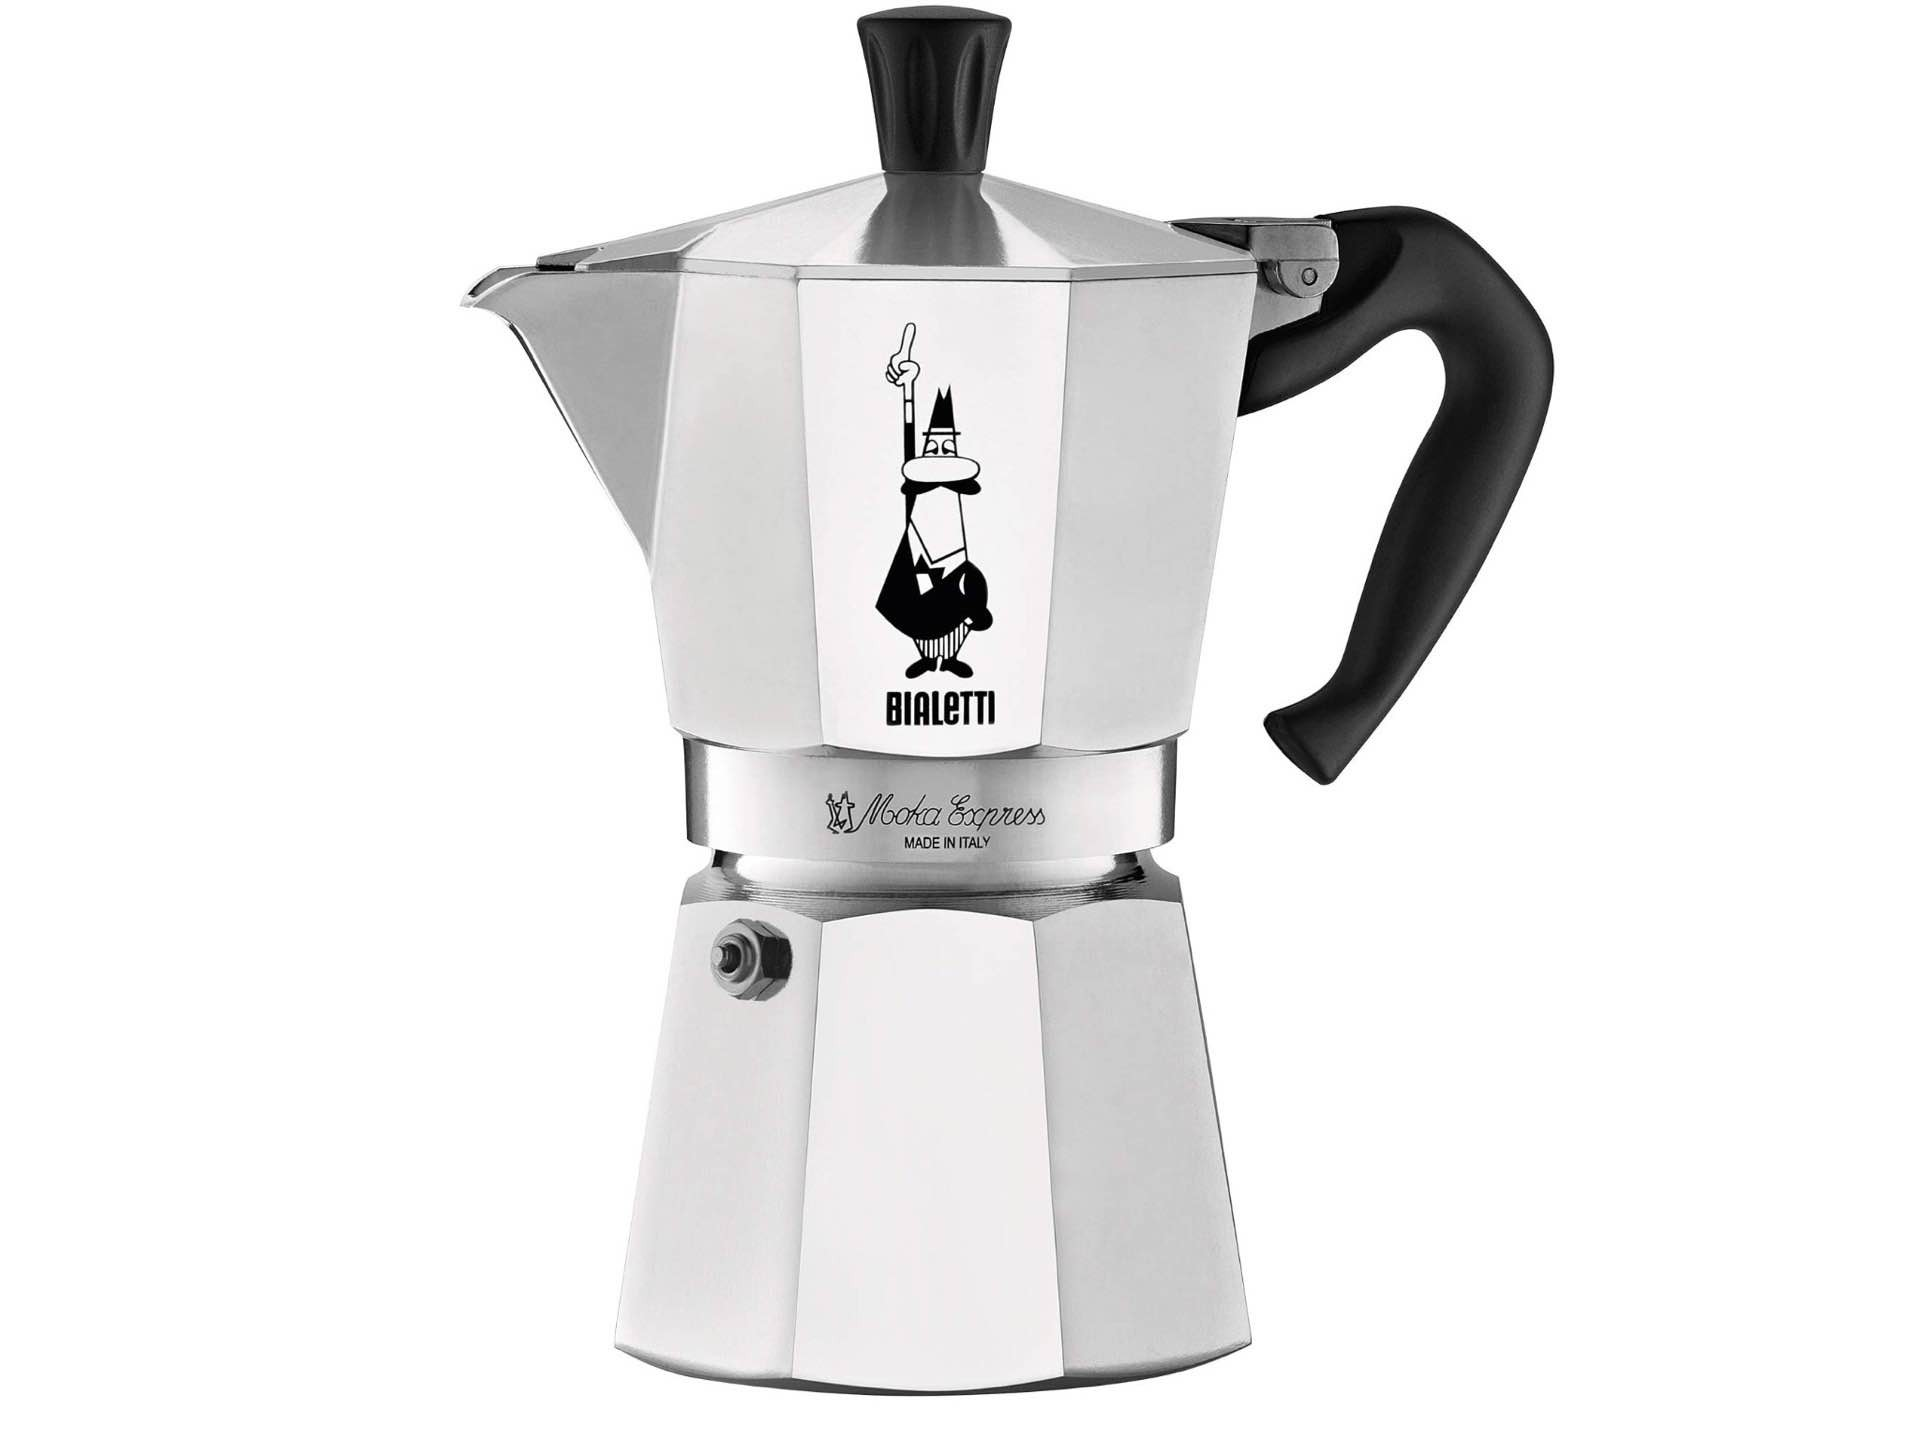 The classic moka pot stovetop coffee maker. ($35)